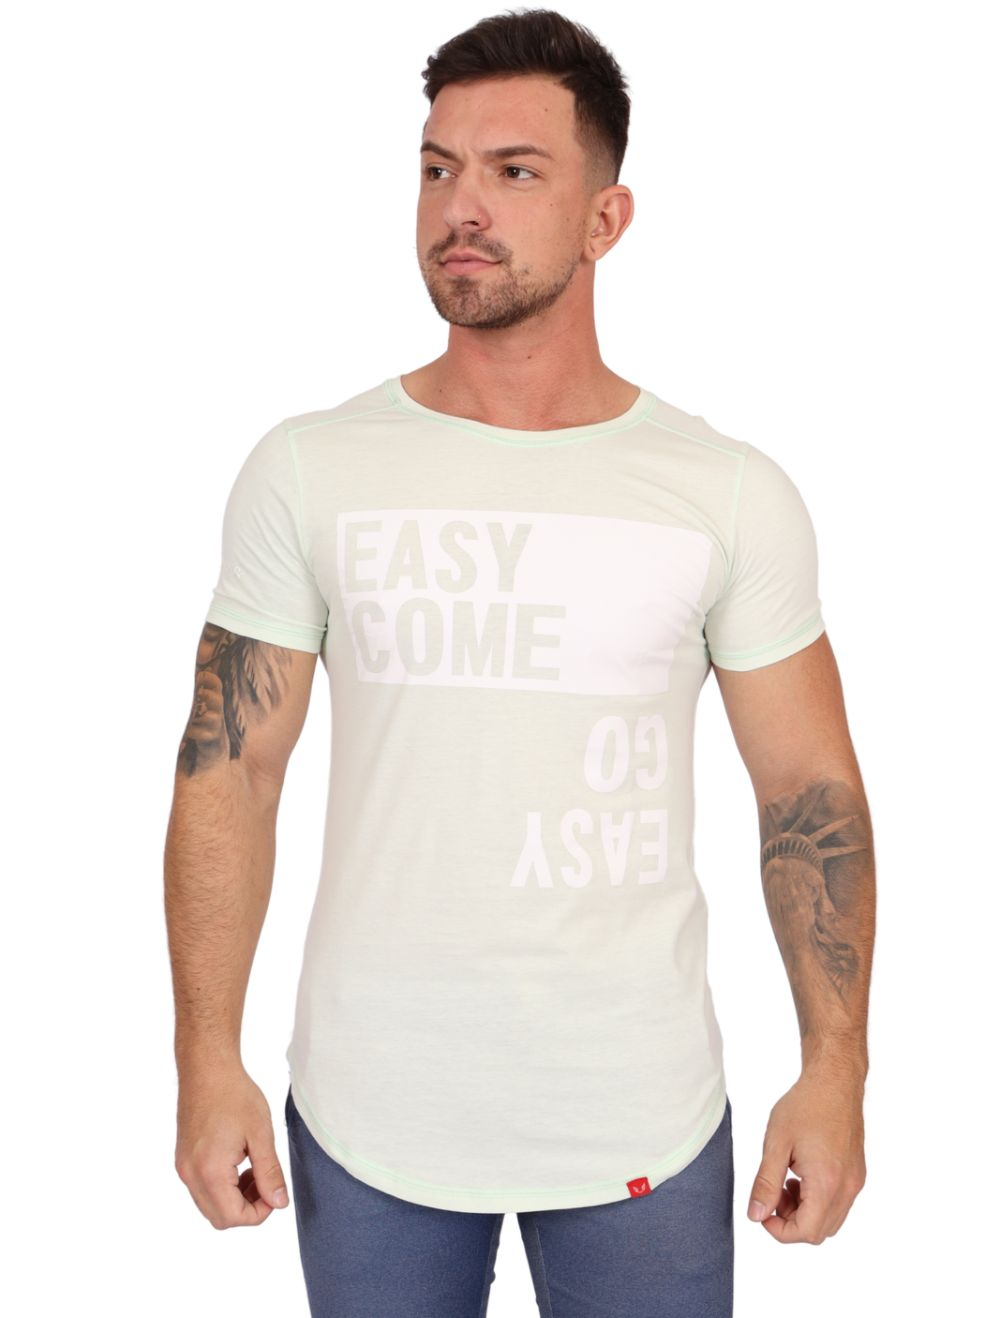 Camiseta Masculina Manga Curta EasyCome EasyGo Verde